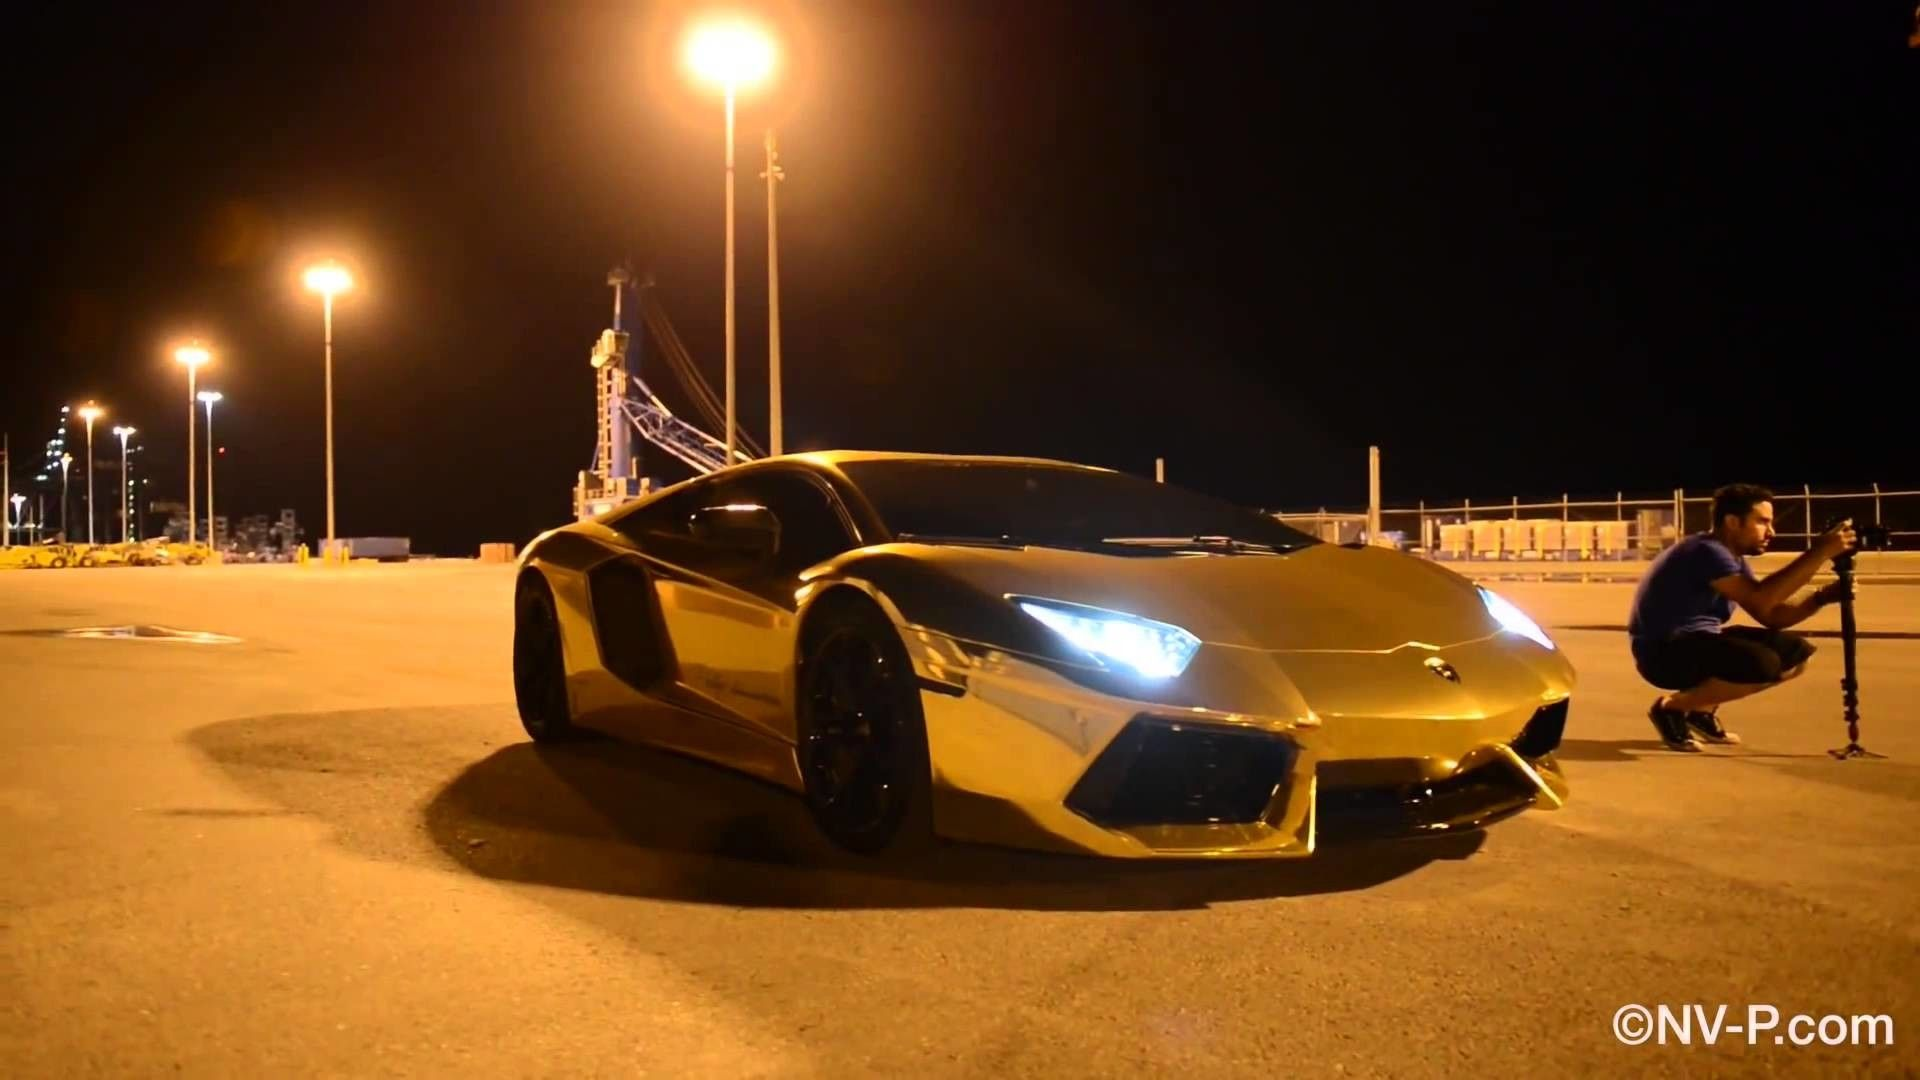 Gold Lamborghini Wallpapers Top Free Gold Lamborghini Backgrounds